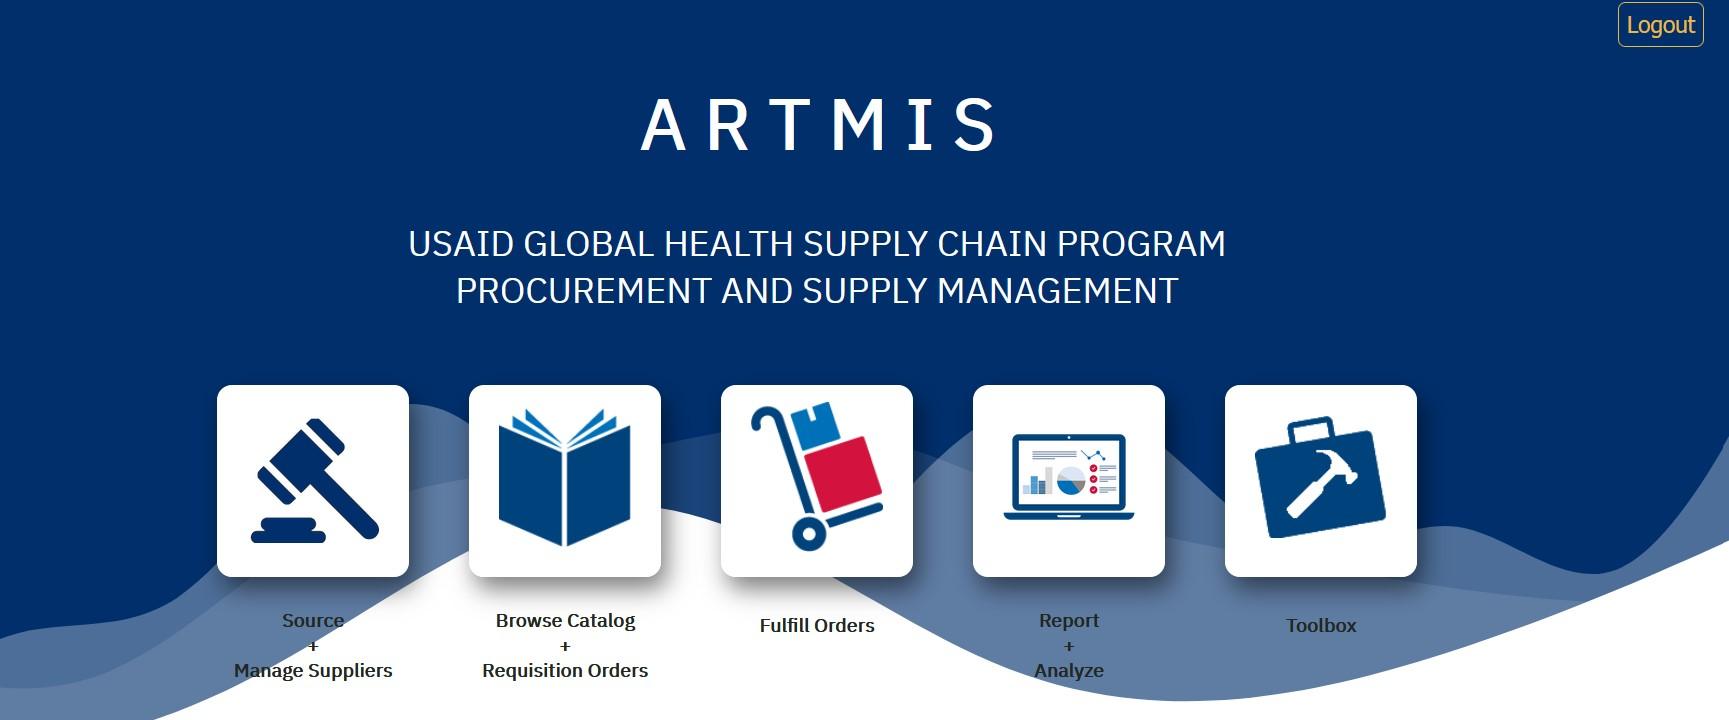 ARTMIS Homepage Image